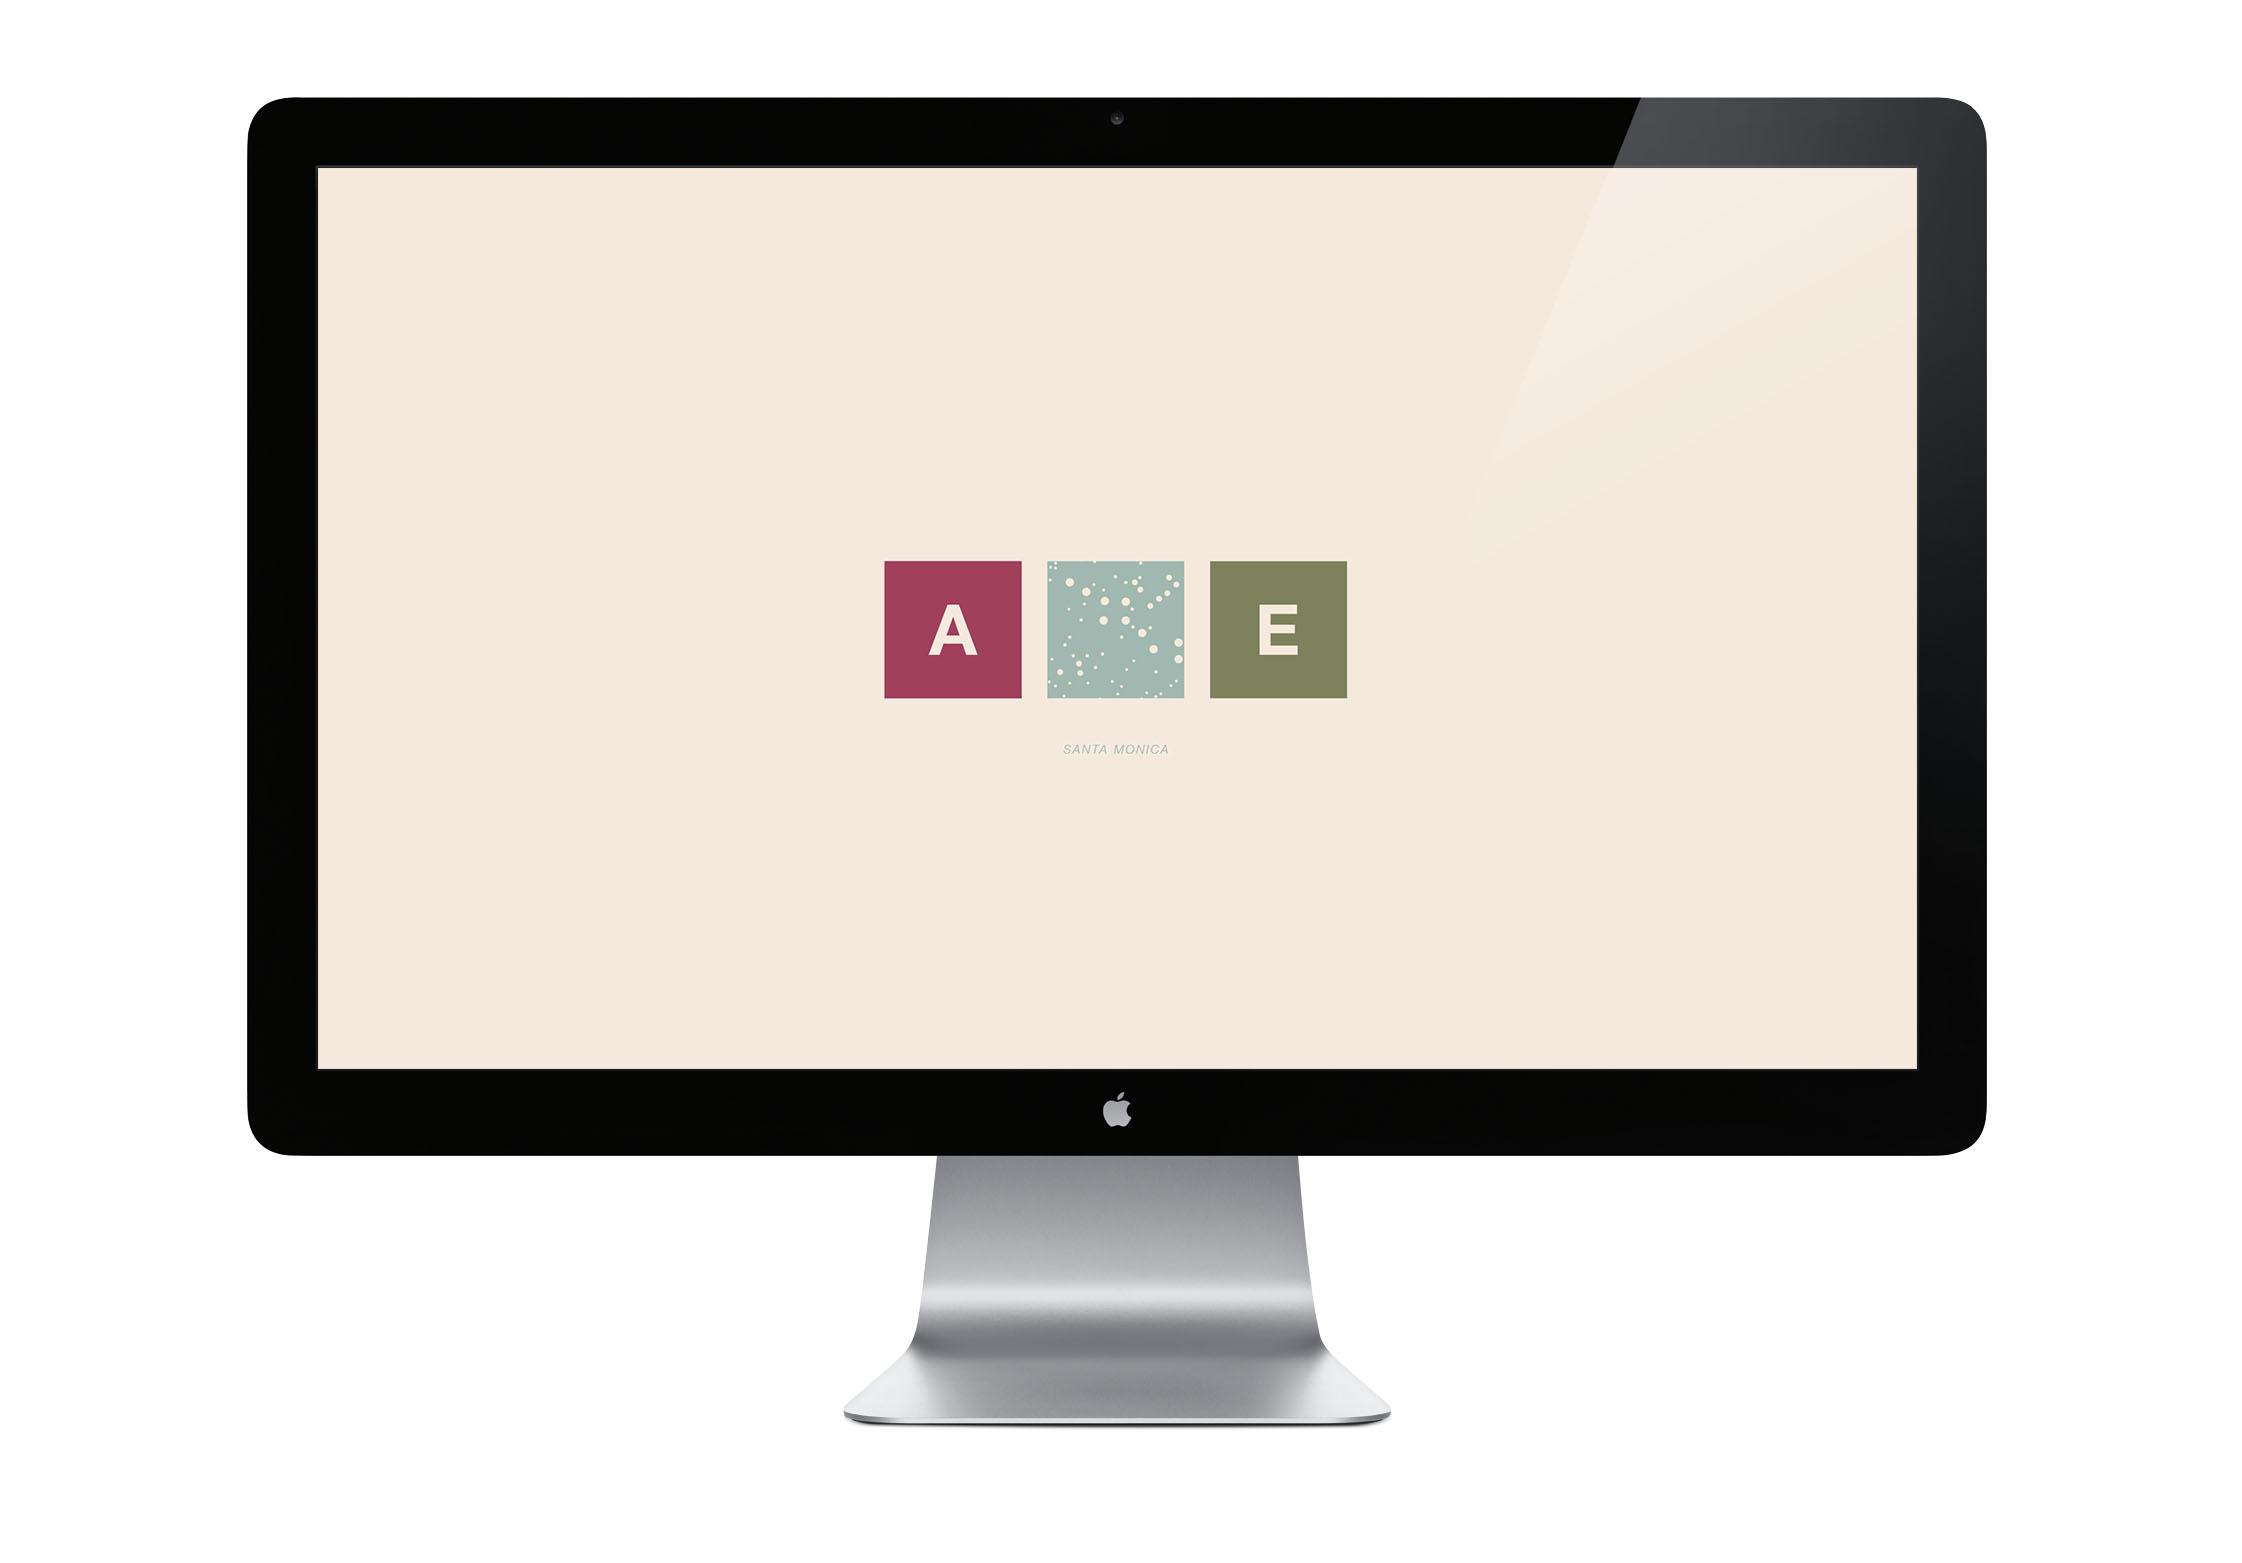 ACEccc.jpg